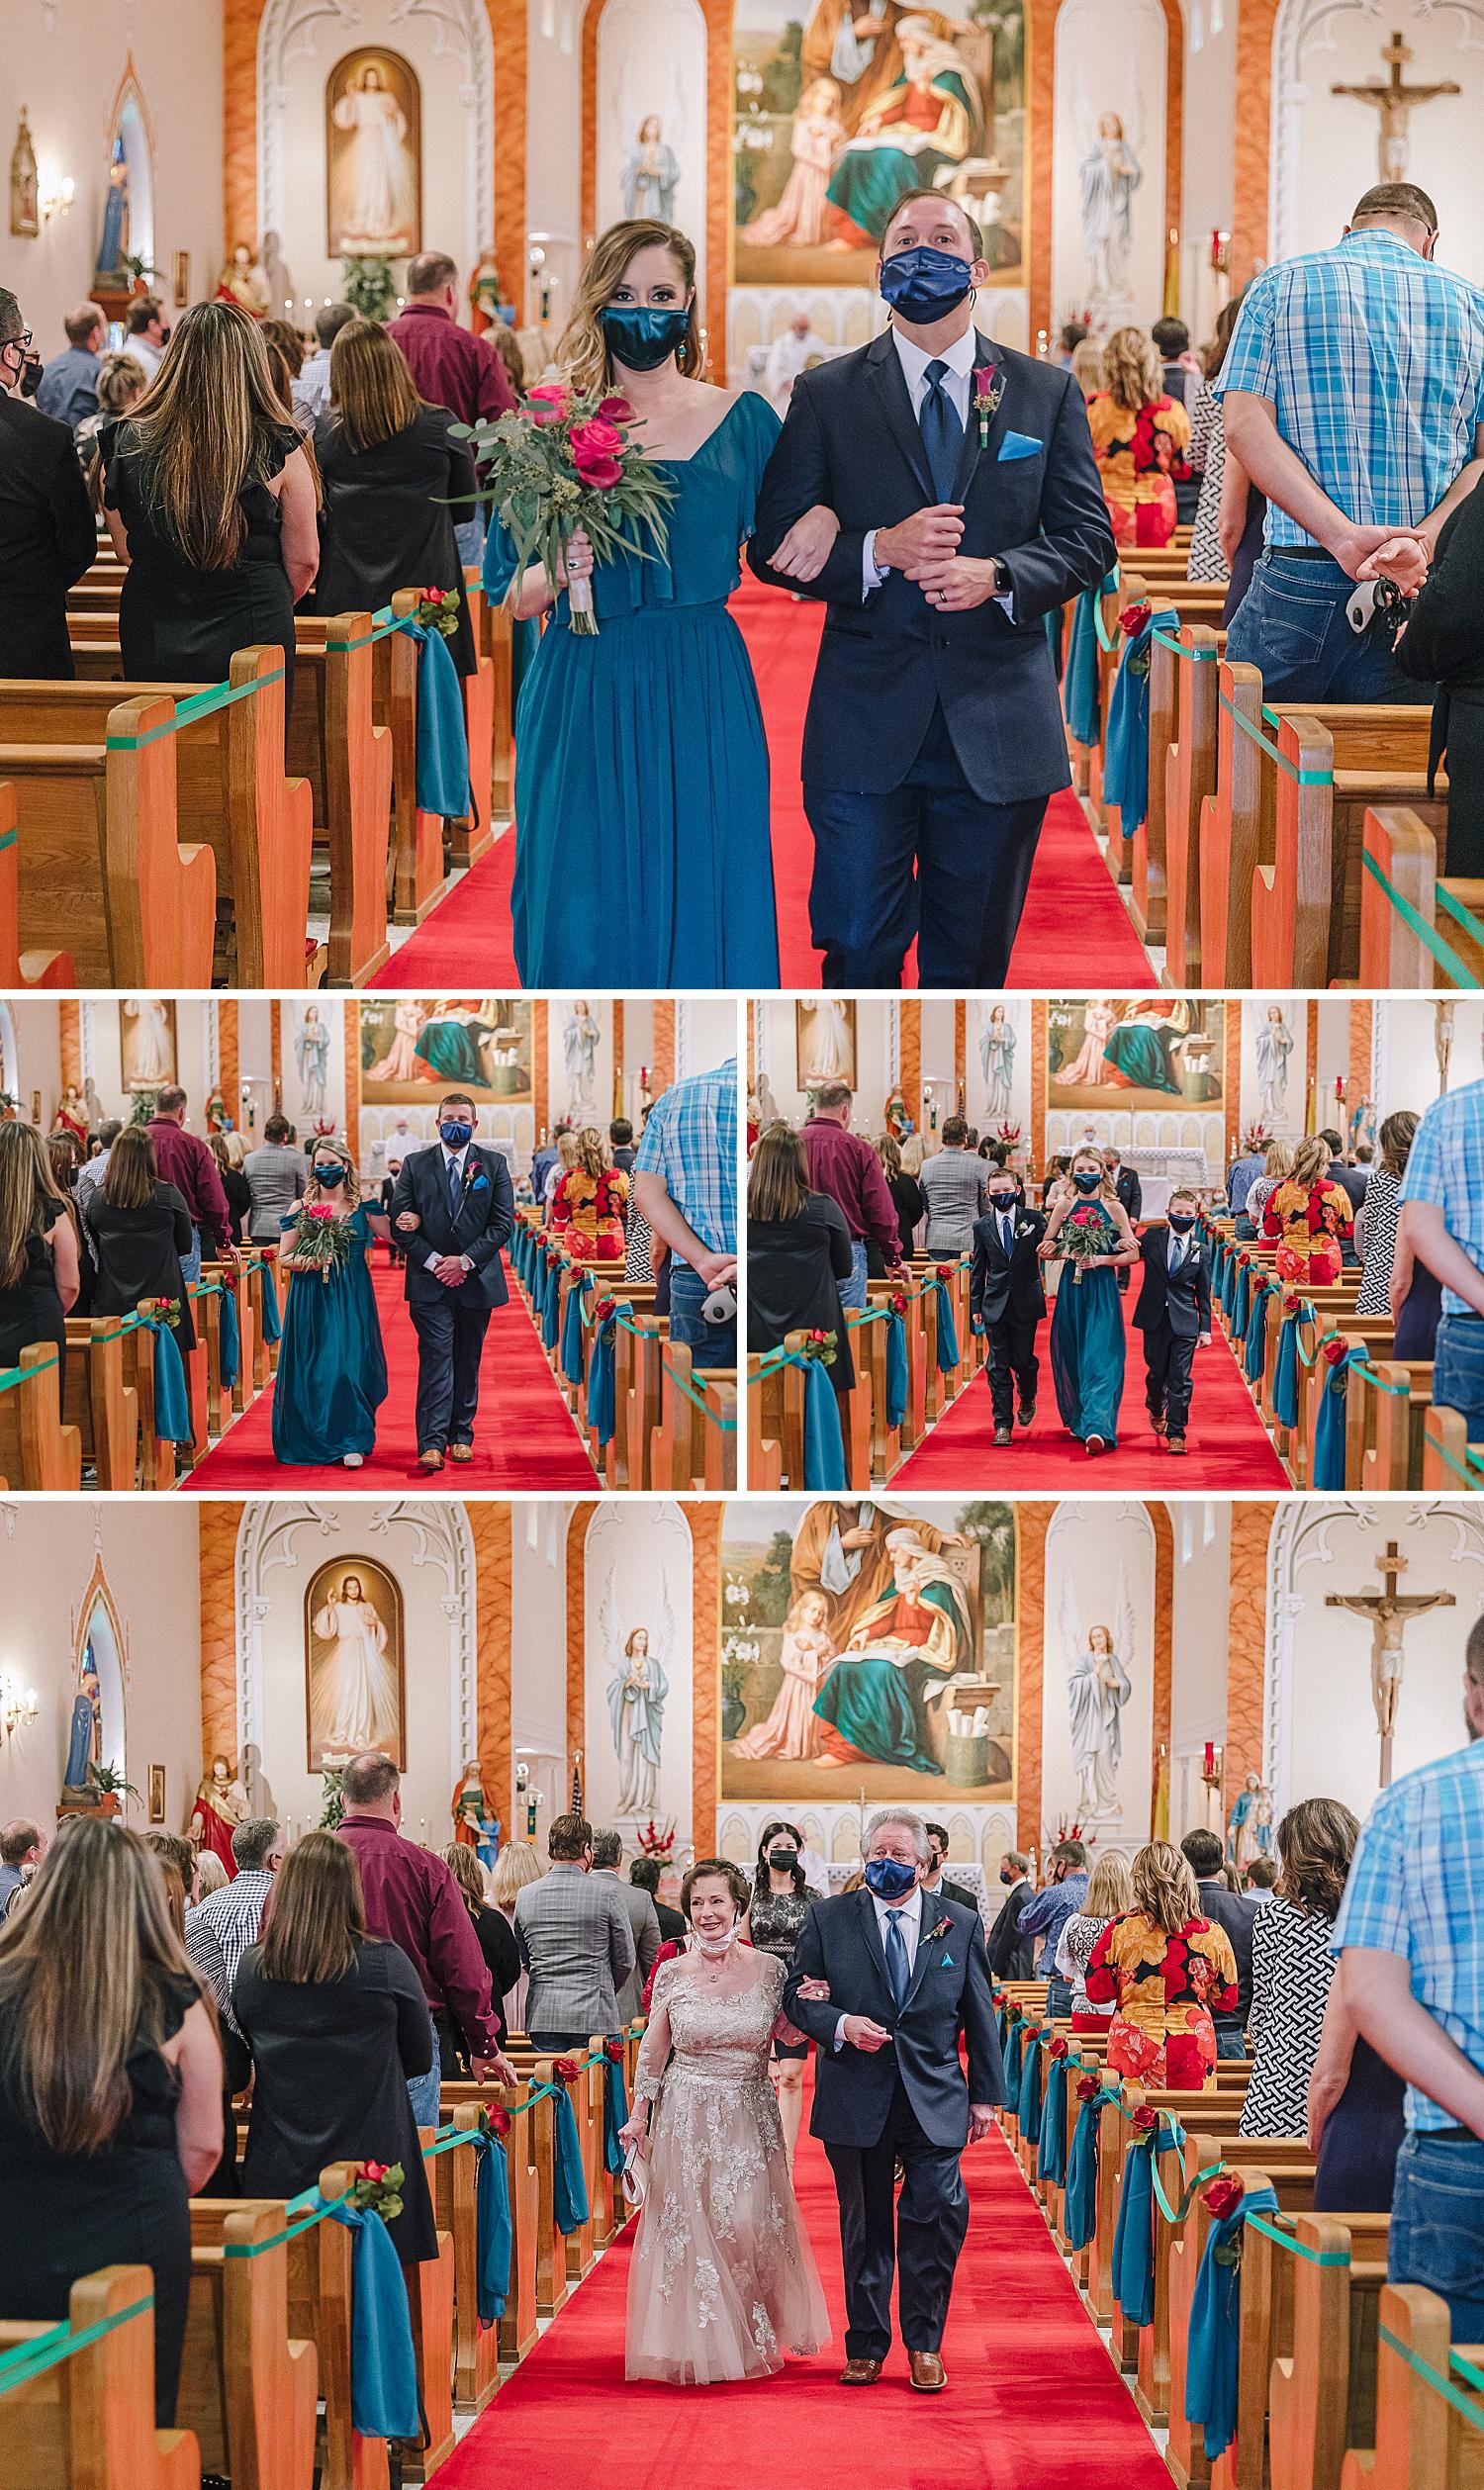 Jewel-Tone-Texas-Wedding-Valerie-Jason-Carly-Barton-Photography_0038.jpg